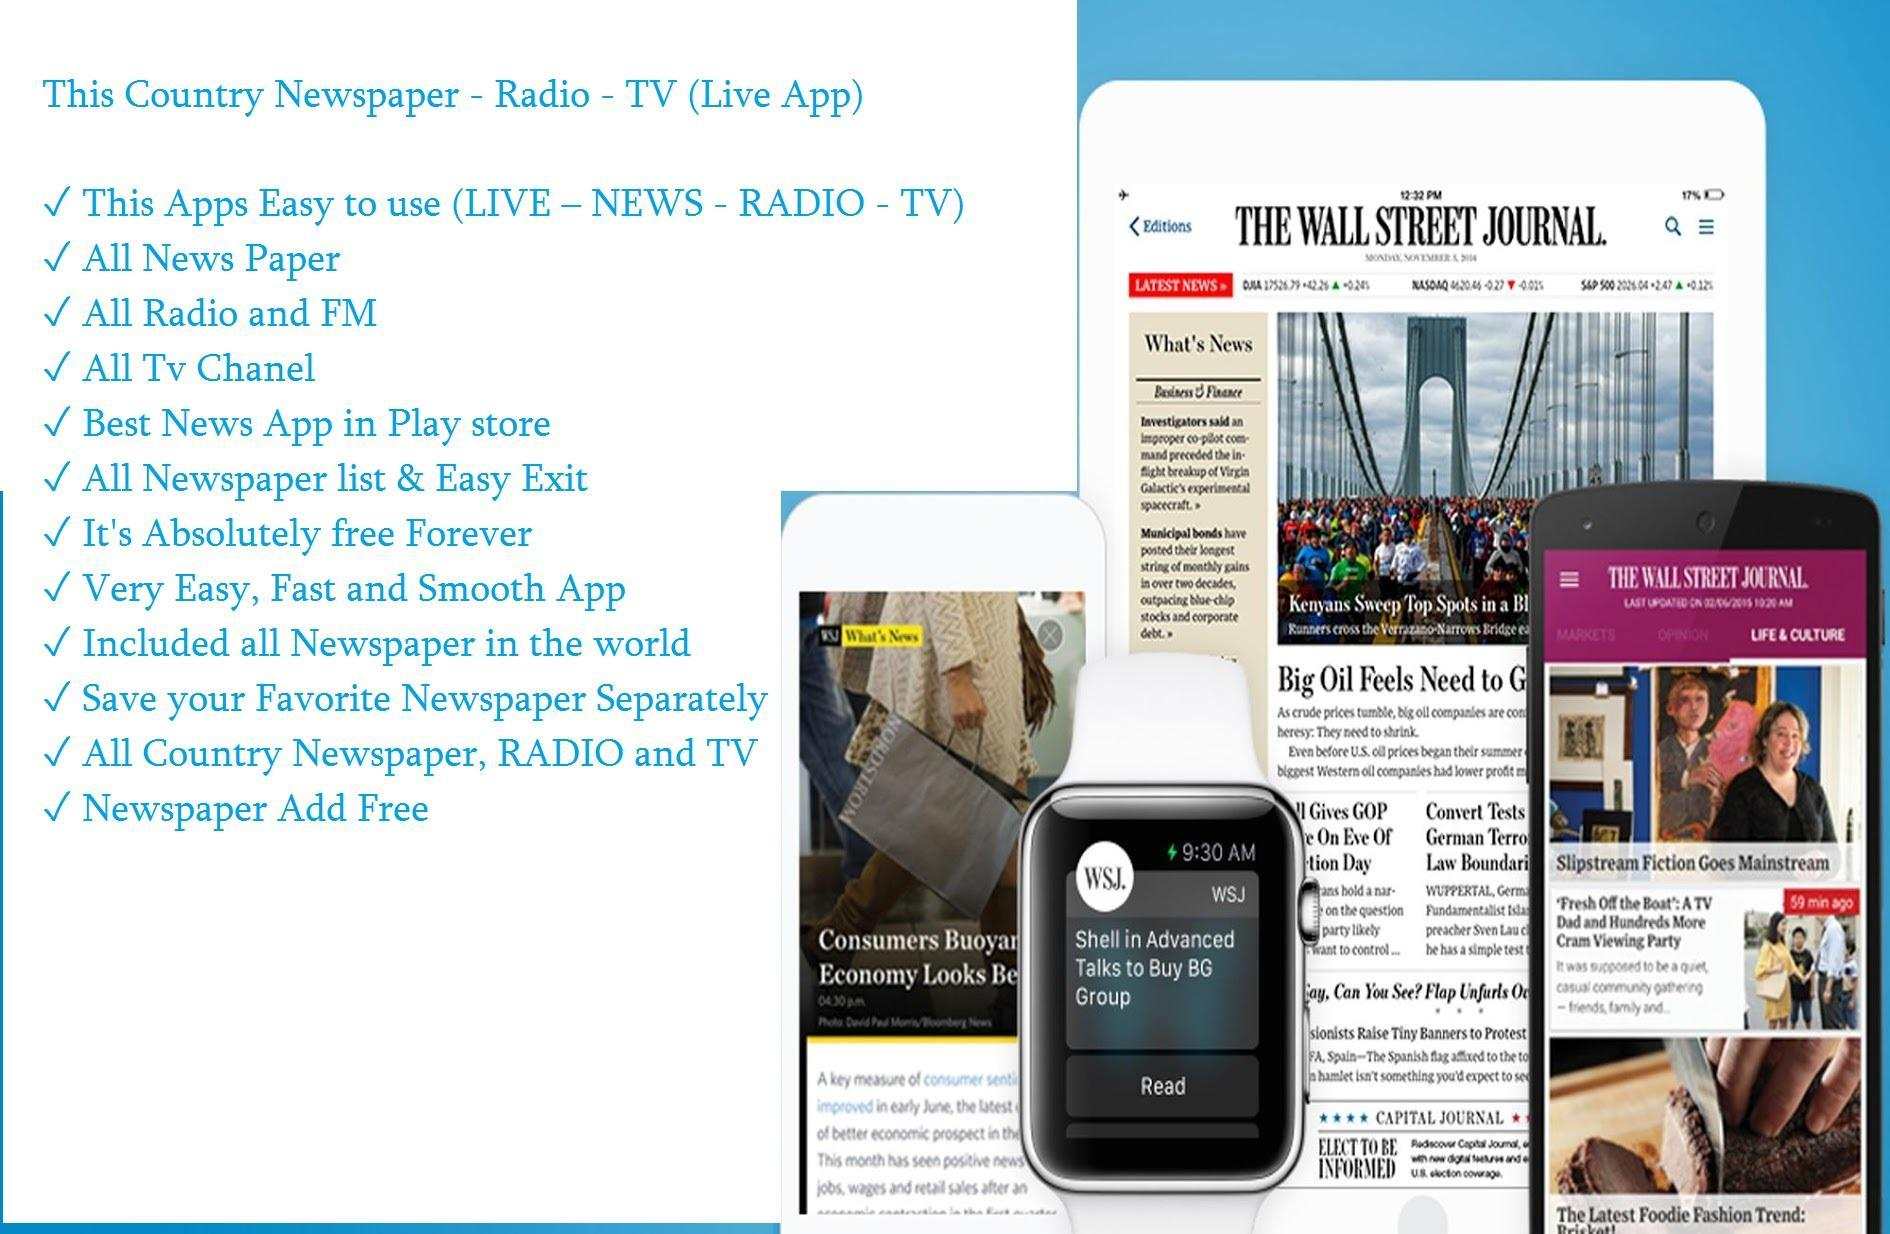 Fiji News, Fiji times, Fiji Sun, Fiji TV, Fiji FM for